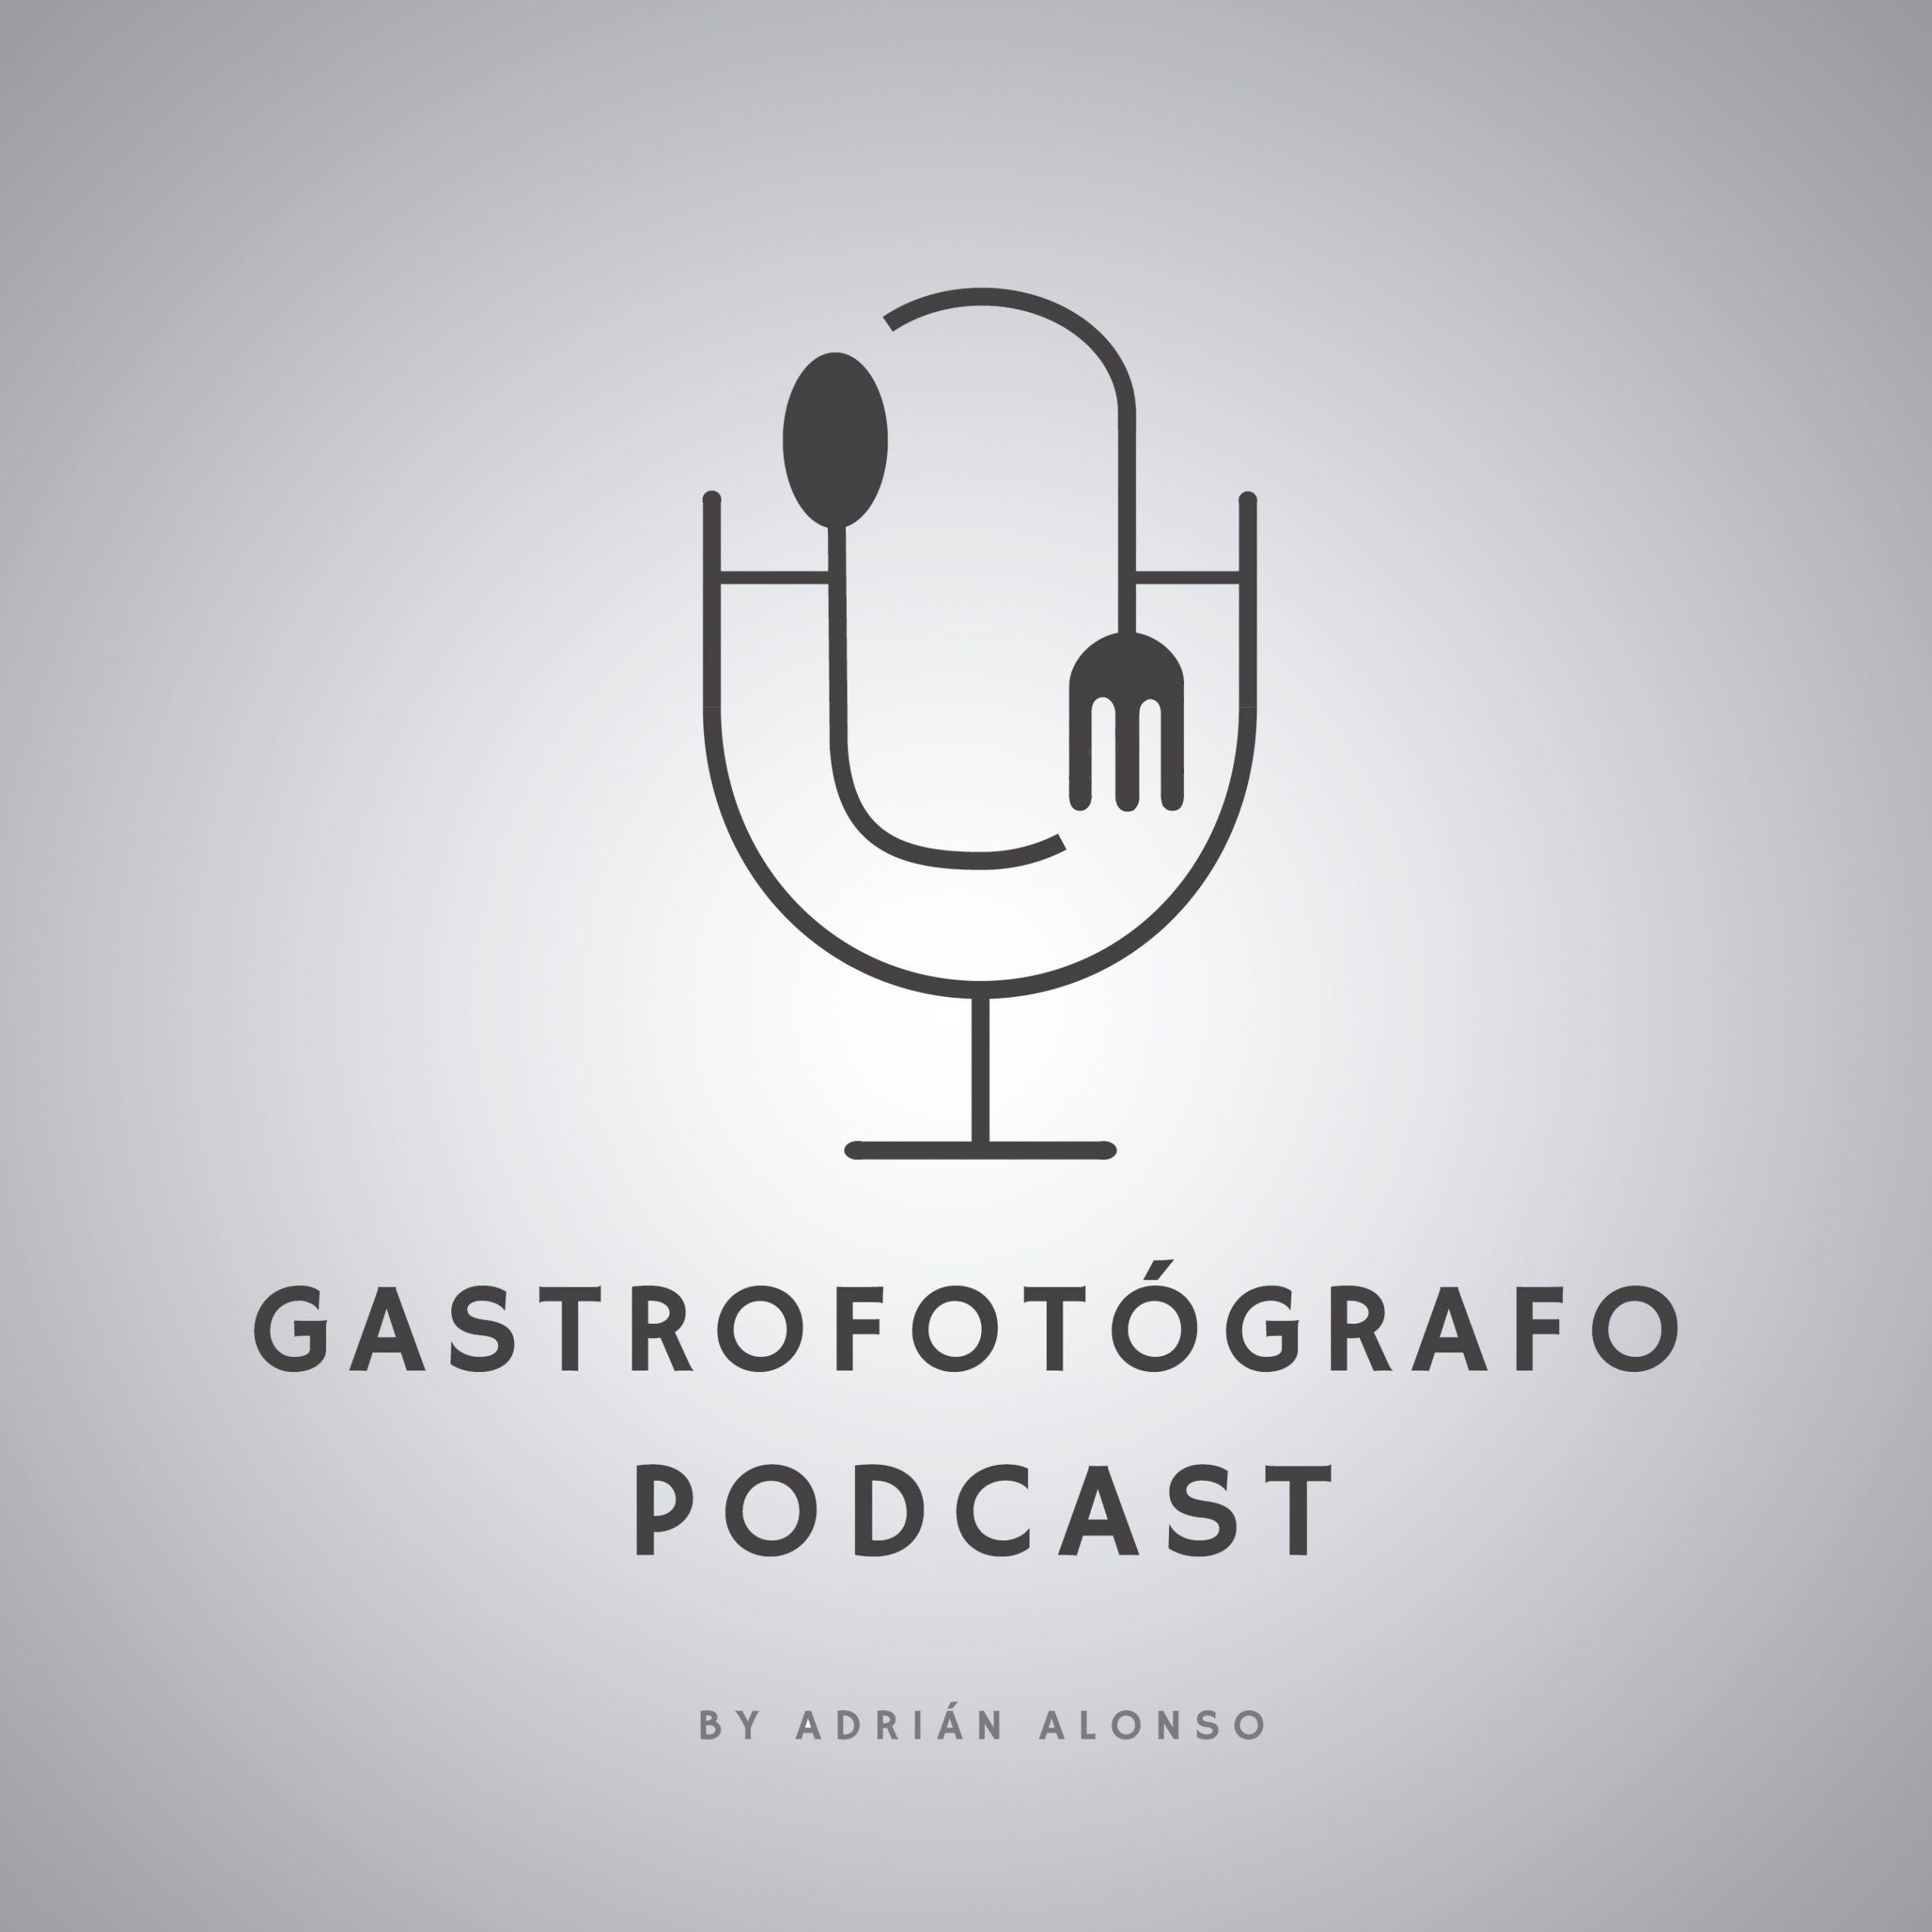 Podcast Gastrofotografo